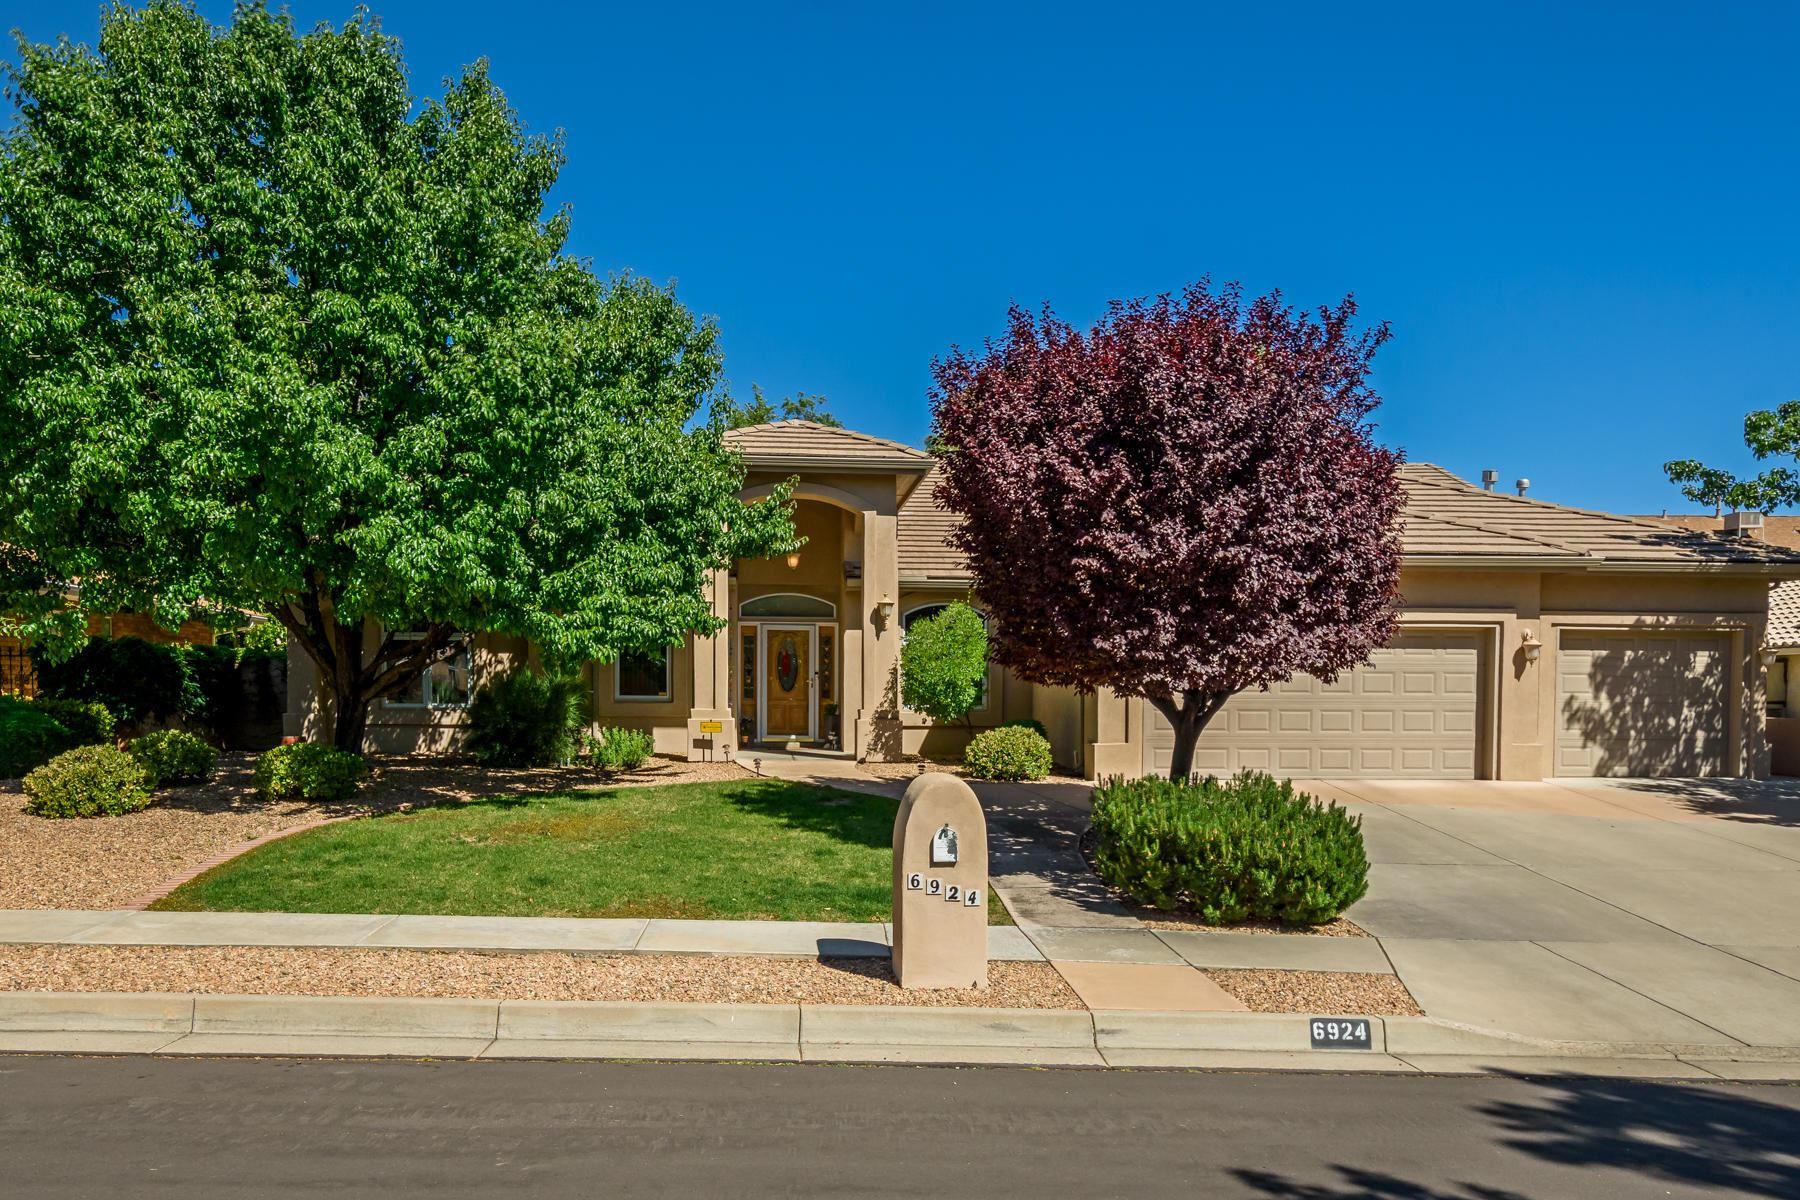 Photo of 6924 BRANDYWINE Loop NE, Albuquerque, NM 87111 (MLS # 968808)